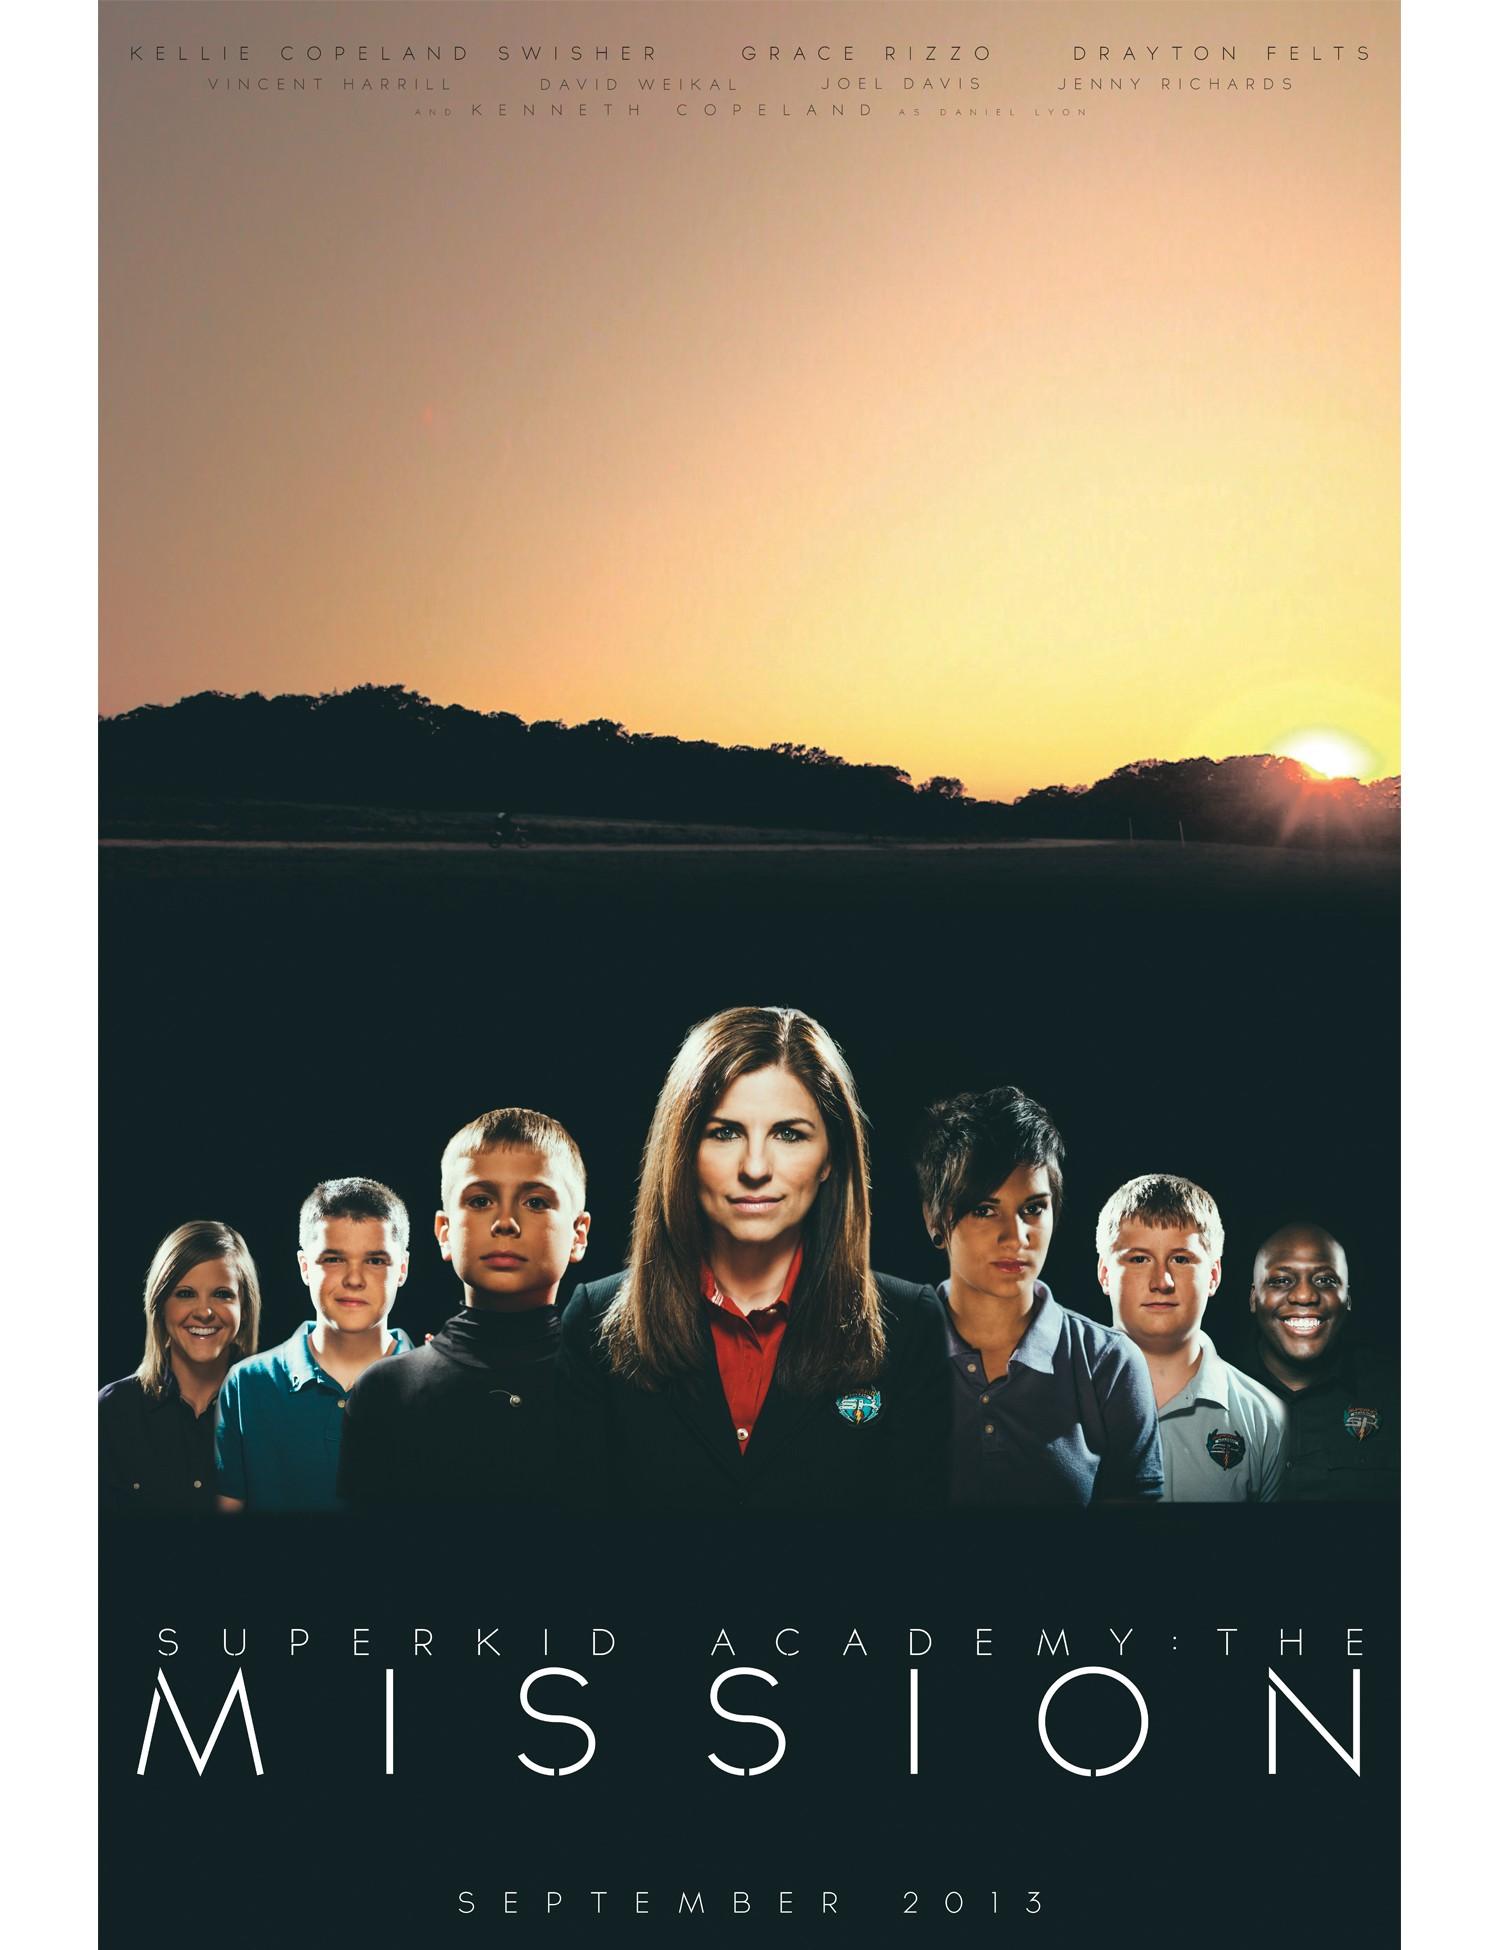 Superkid Academy: The Mission (2013) - IMDb